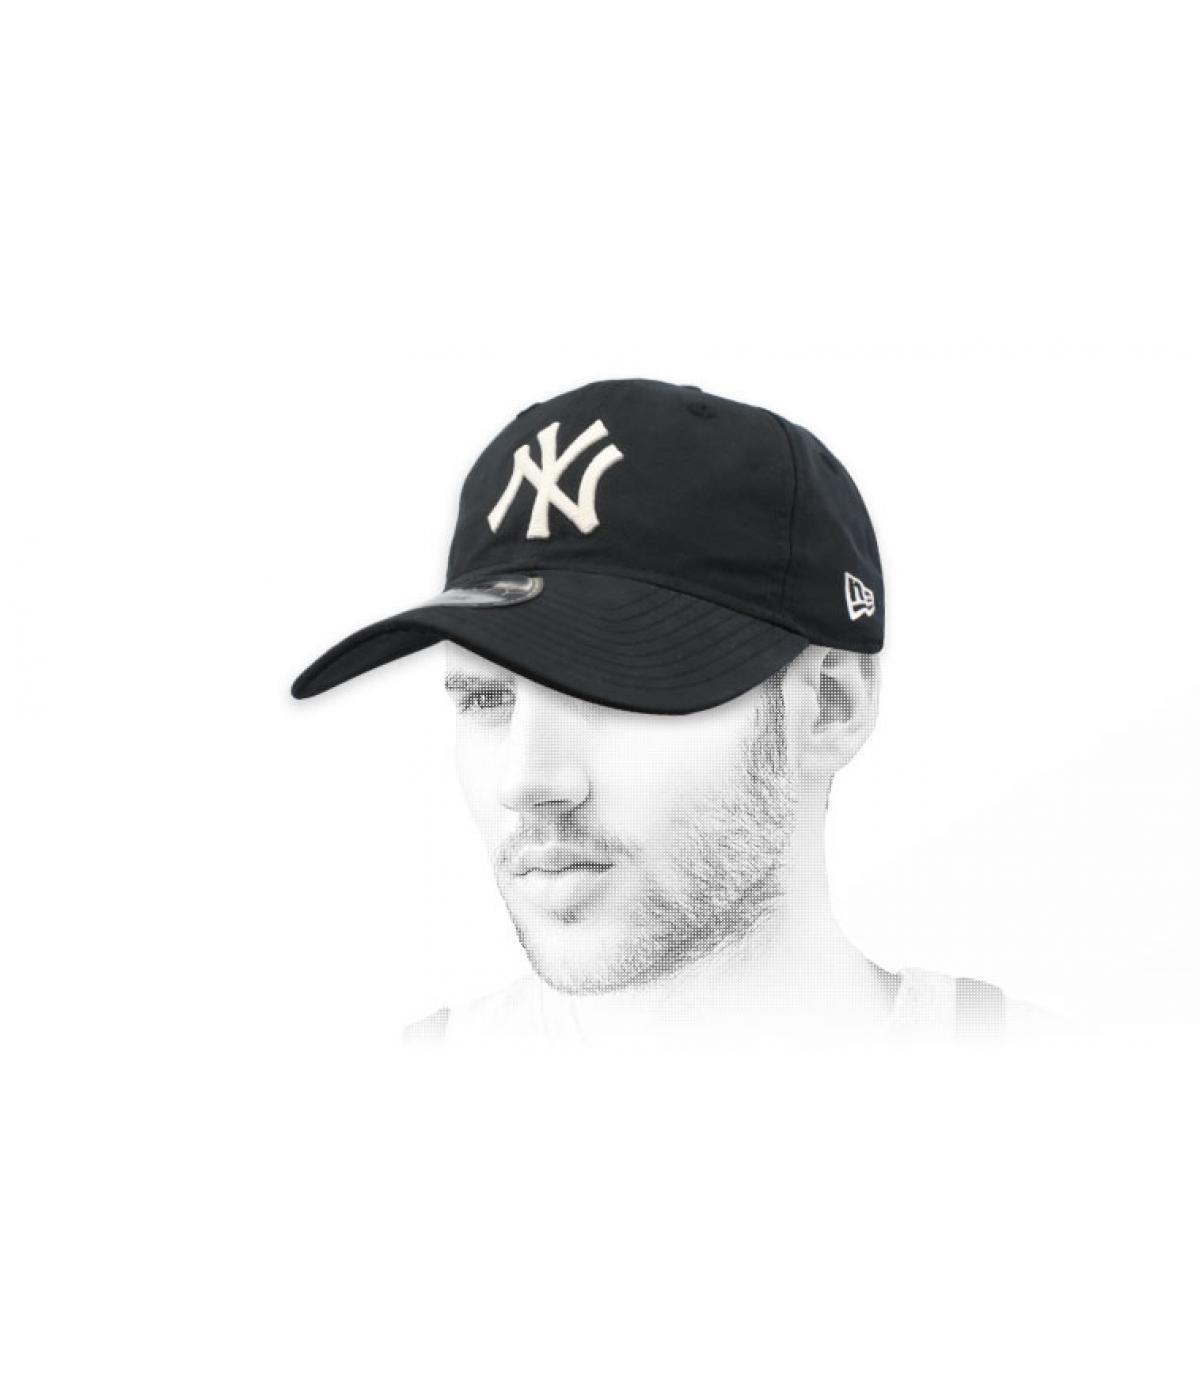 zwarte opvouwbare NY-cap